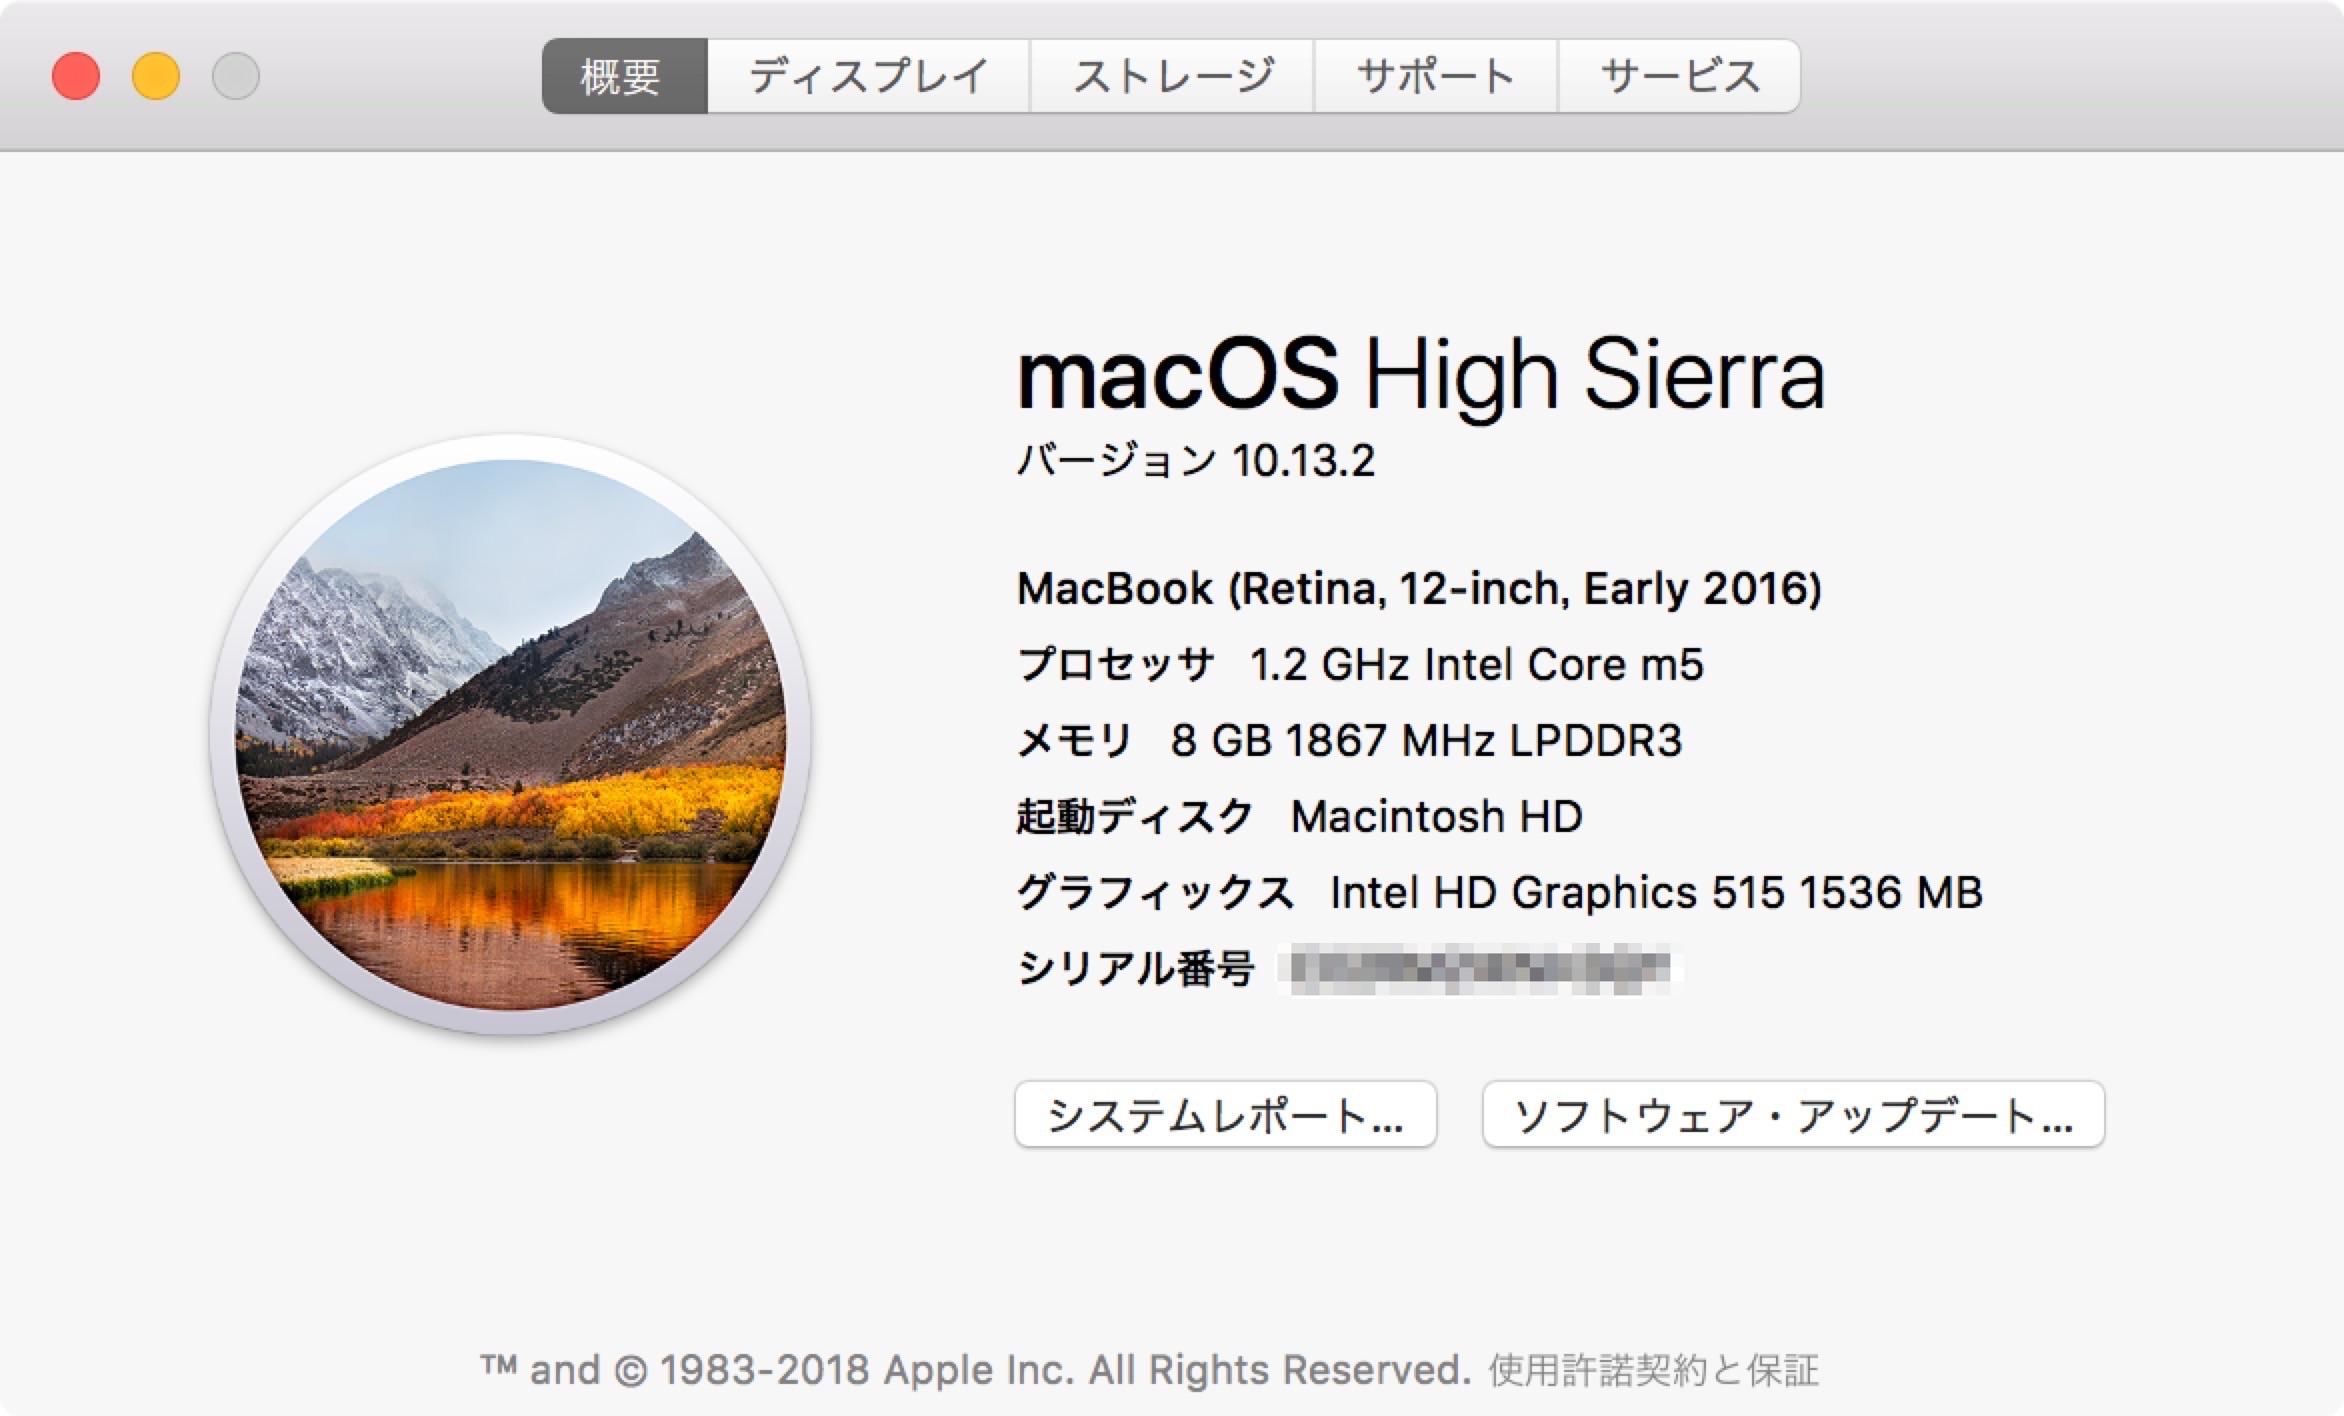 macOS10.13.2追加アップデート(Supplemental Update)リリース。macOS High Sierra(10.13)の人はすぐにアップデートしよう!